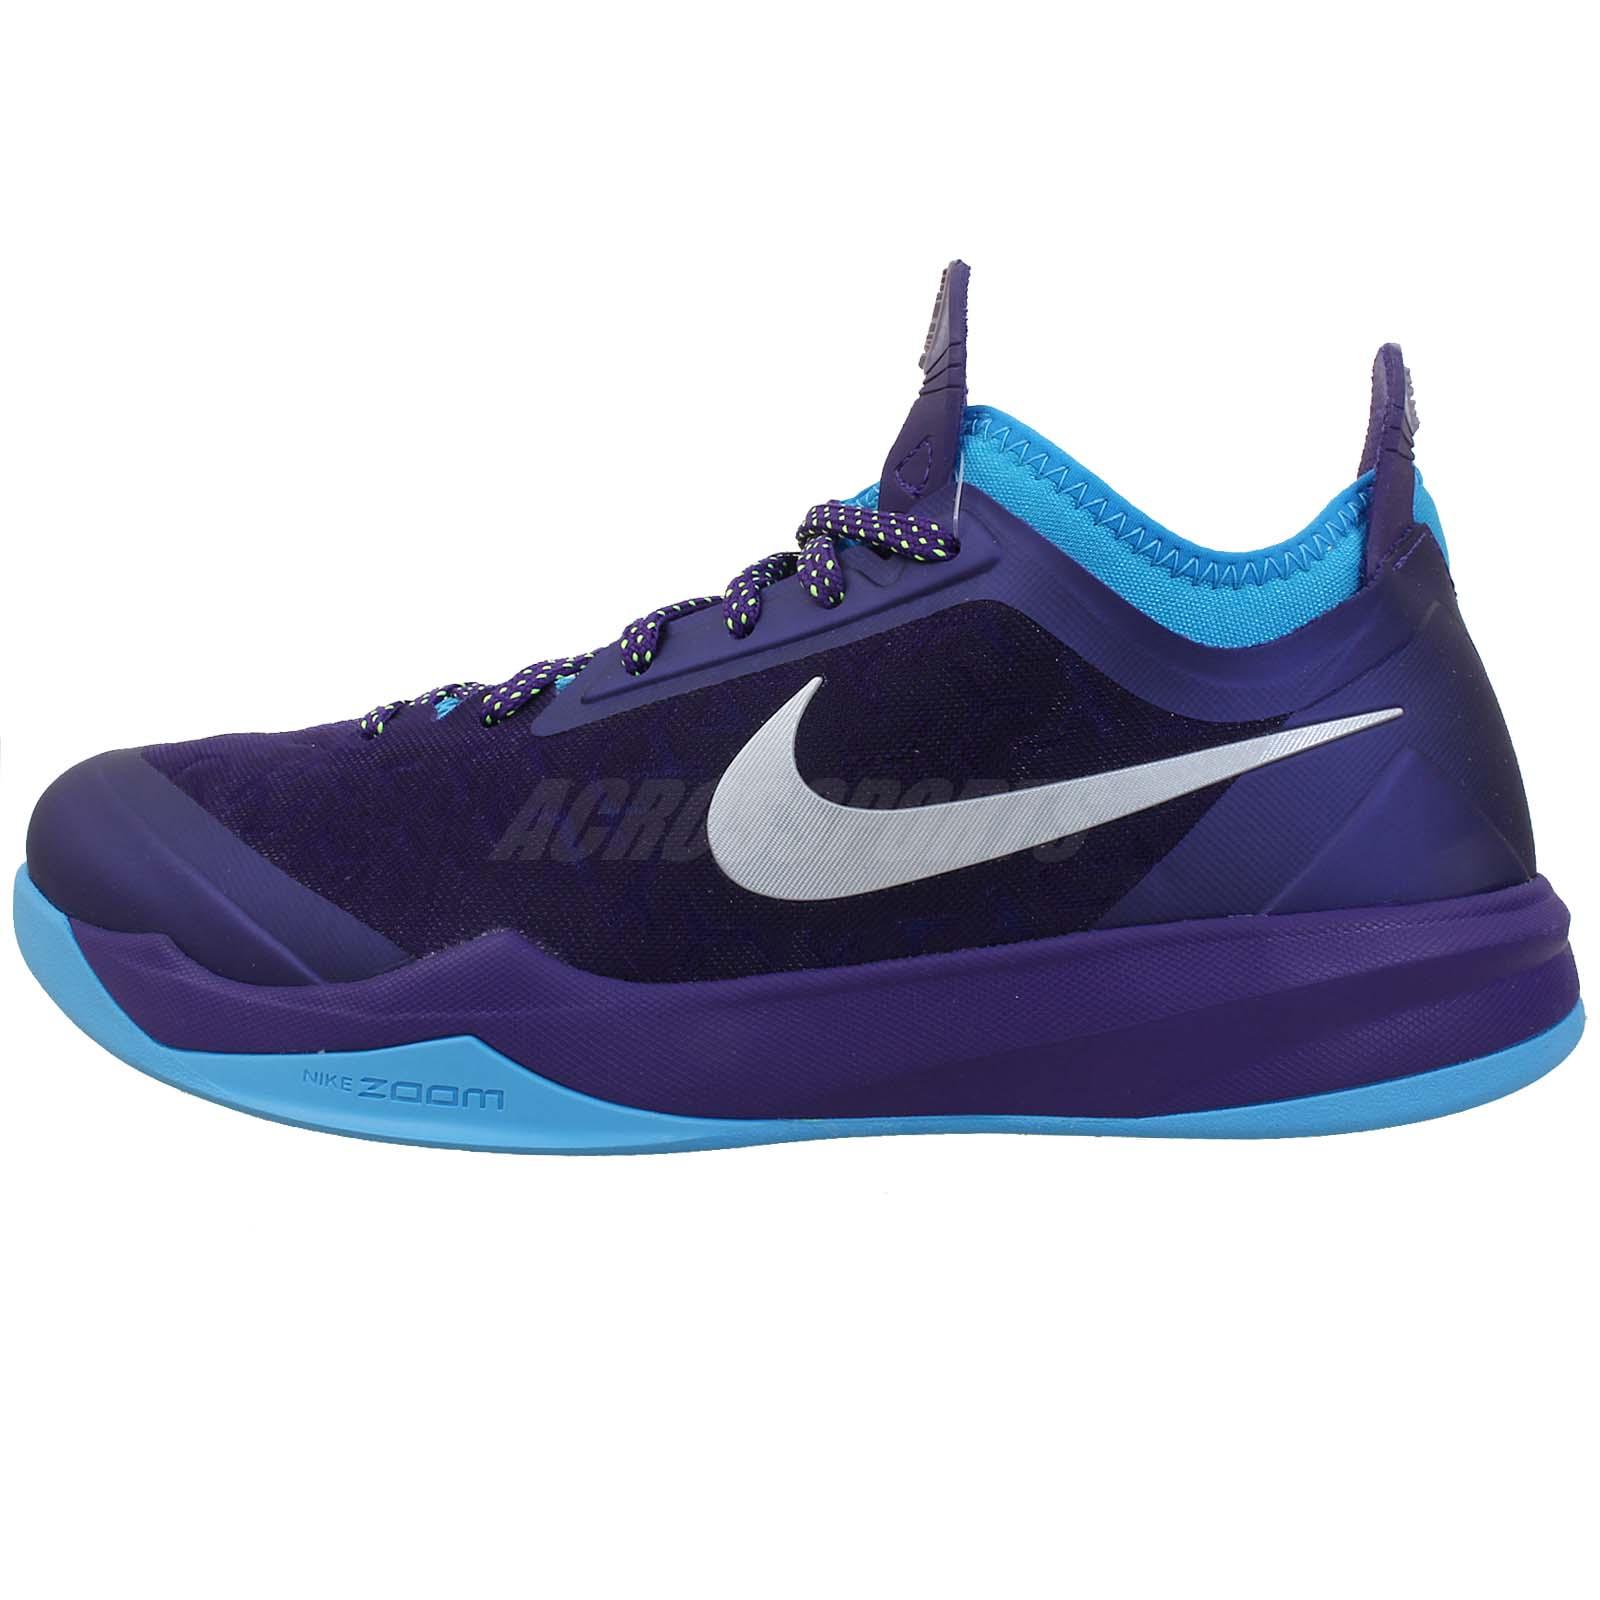 Nike Zoom Crusader Xdr James Harden Basketball Shoes